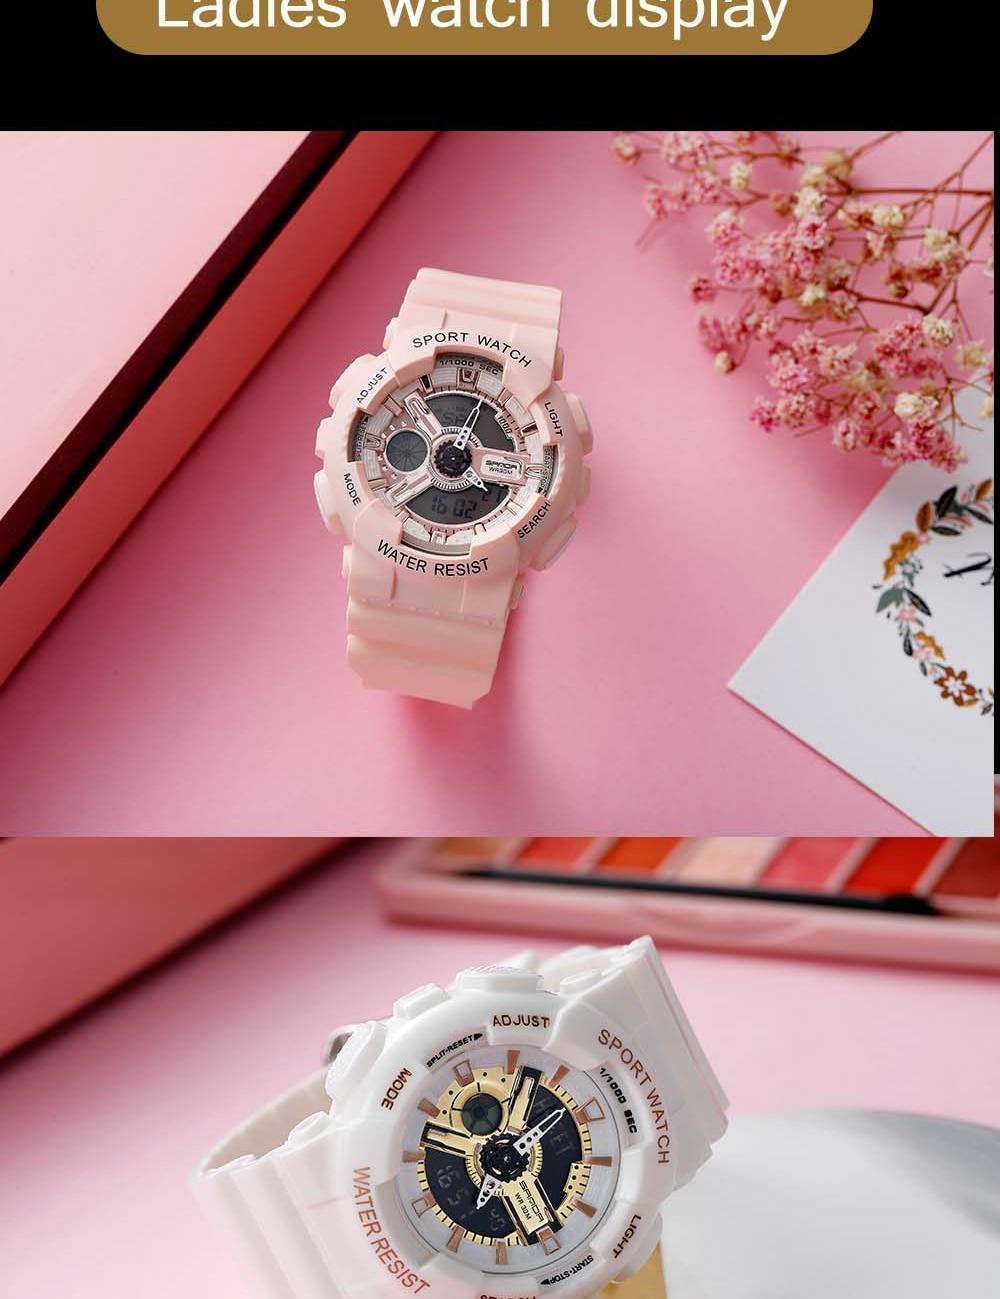 H382ee721f54b40aeb33fe623d67b0890l 2020 SANDA Military Men's Watch Brand Luxury Waterproof Sport Wristwatch Fashion Quartz Clock Couple Watch relogio masculino